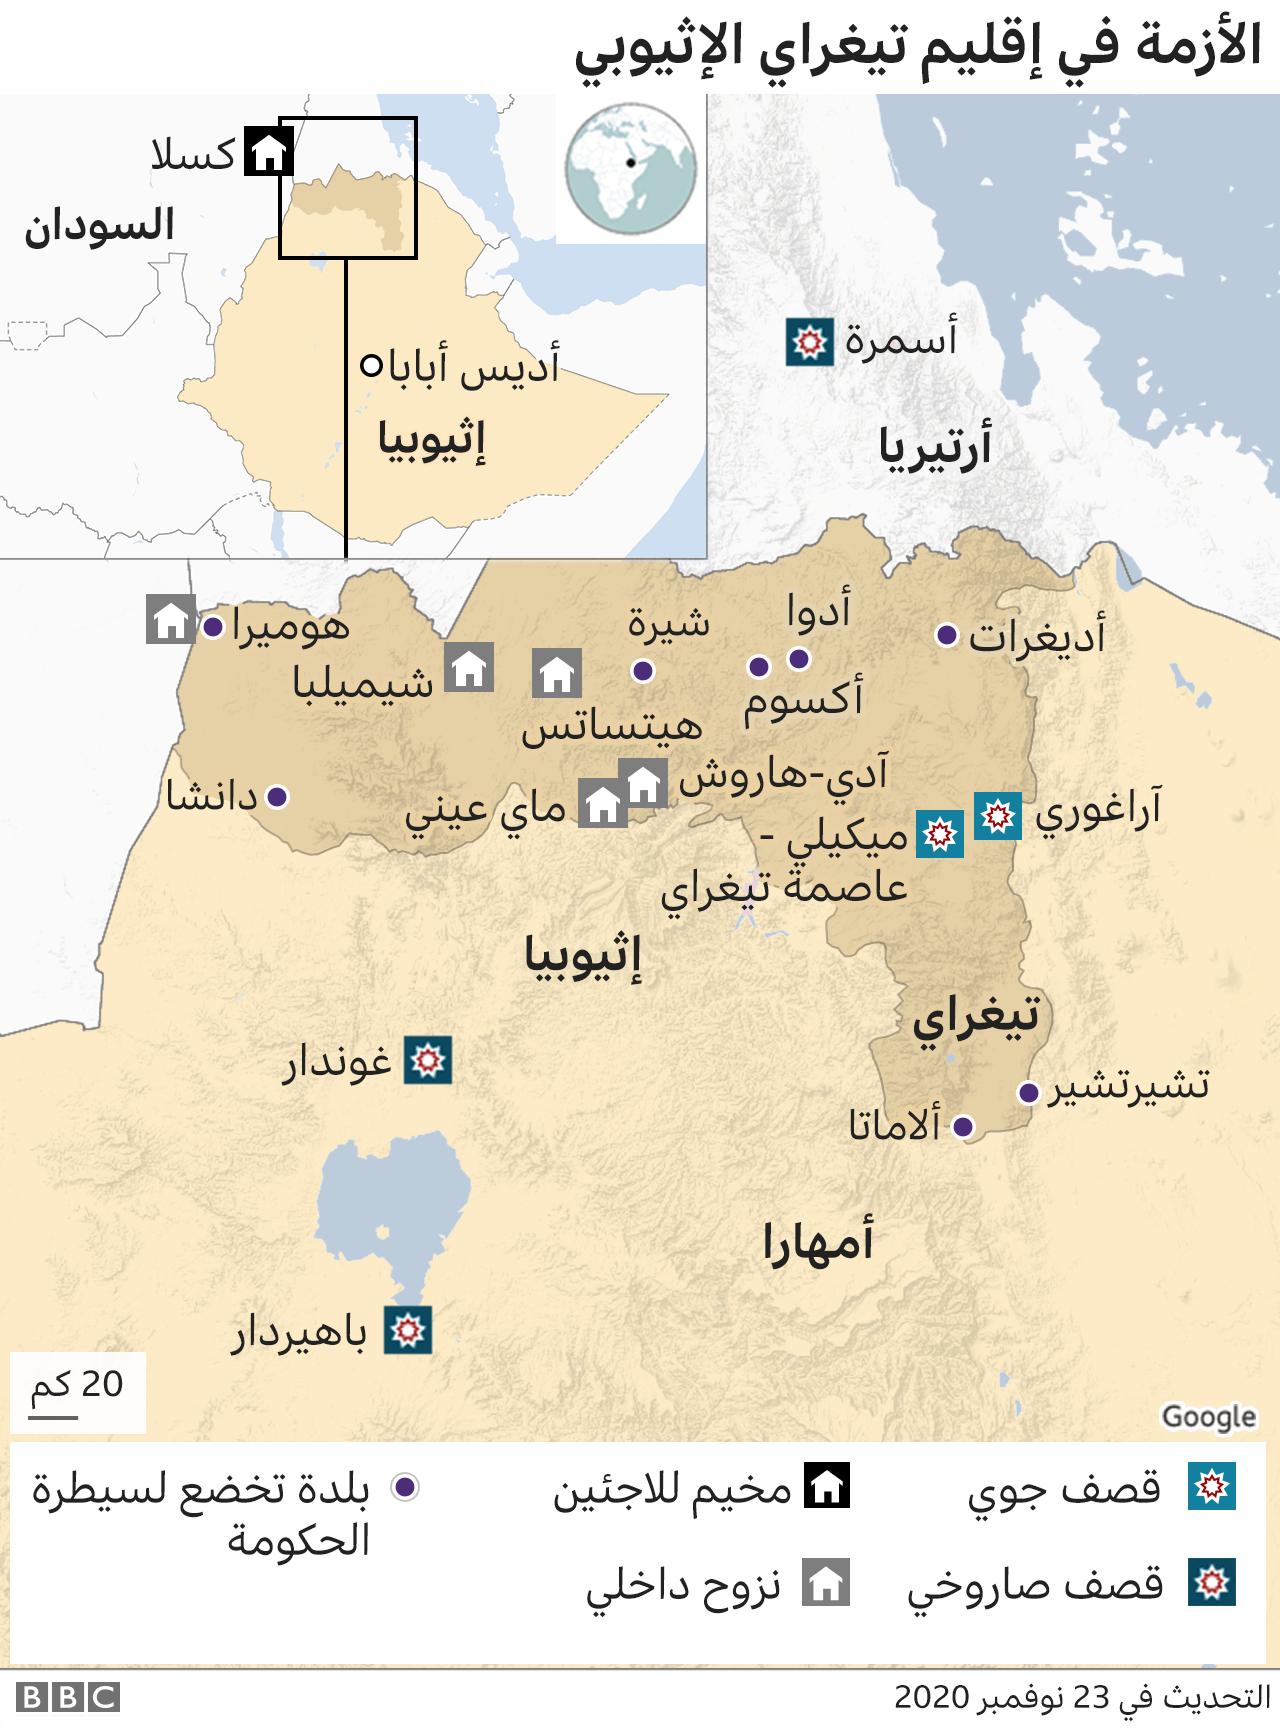 خريطة تيغراي